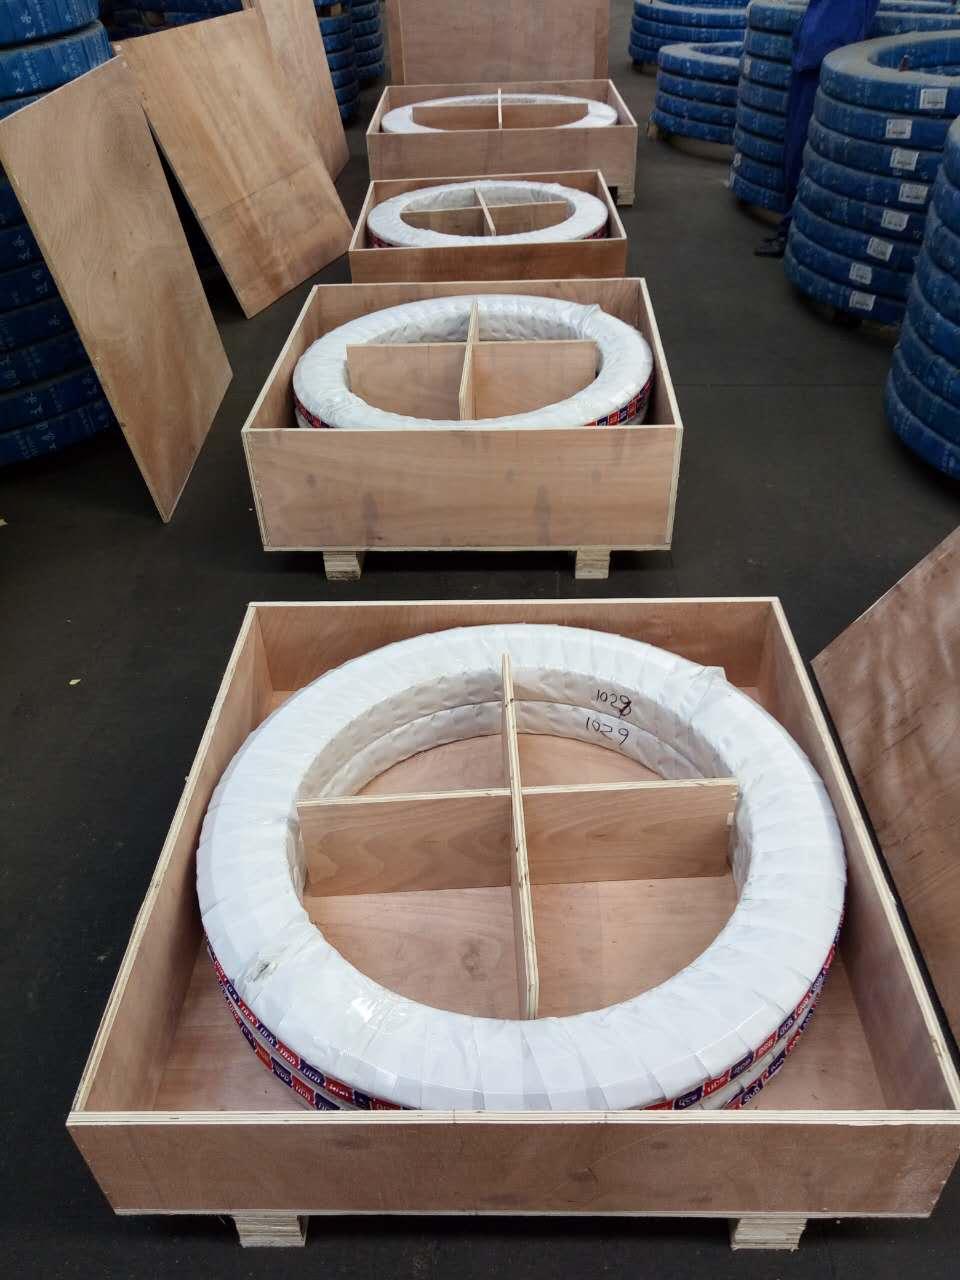 TR250M-4 Crane Slewing Ring, TR250M-4 Crane Slew Ring, TR250M-4 Tadano Crane Bearing